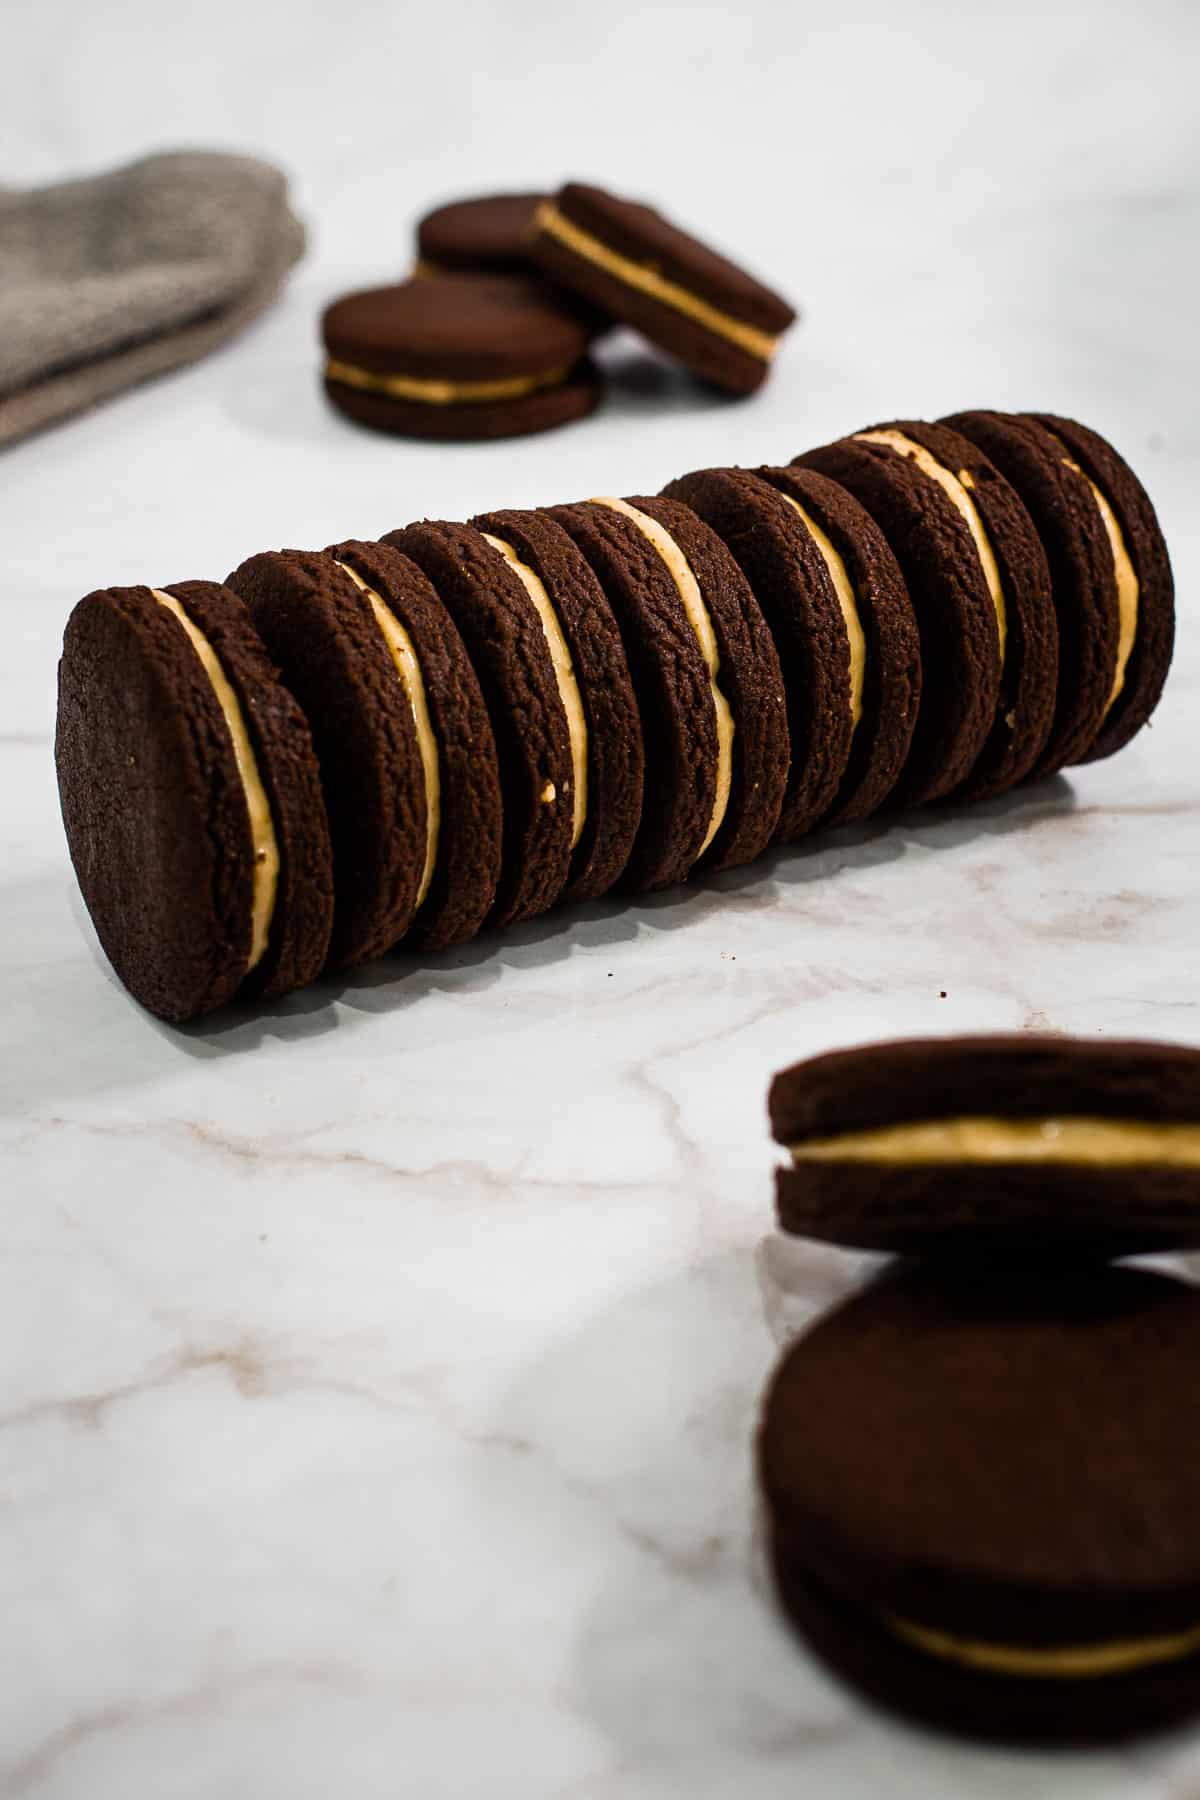 A row of chocolate sandwich cookies